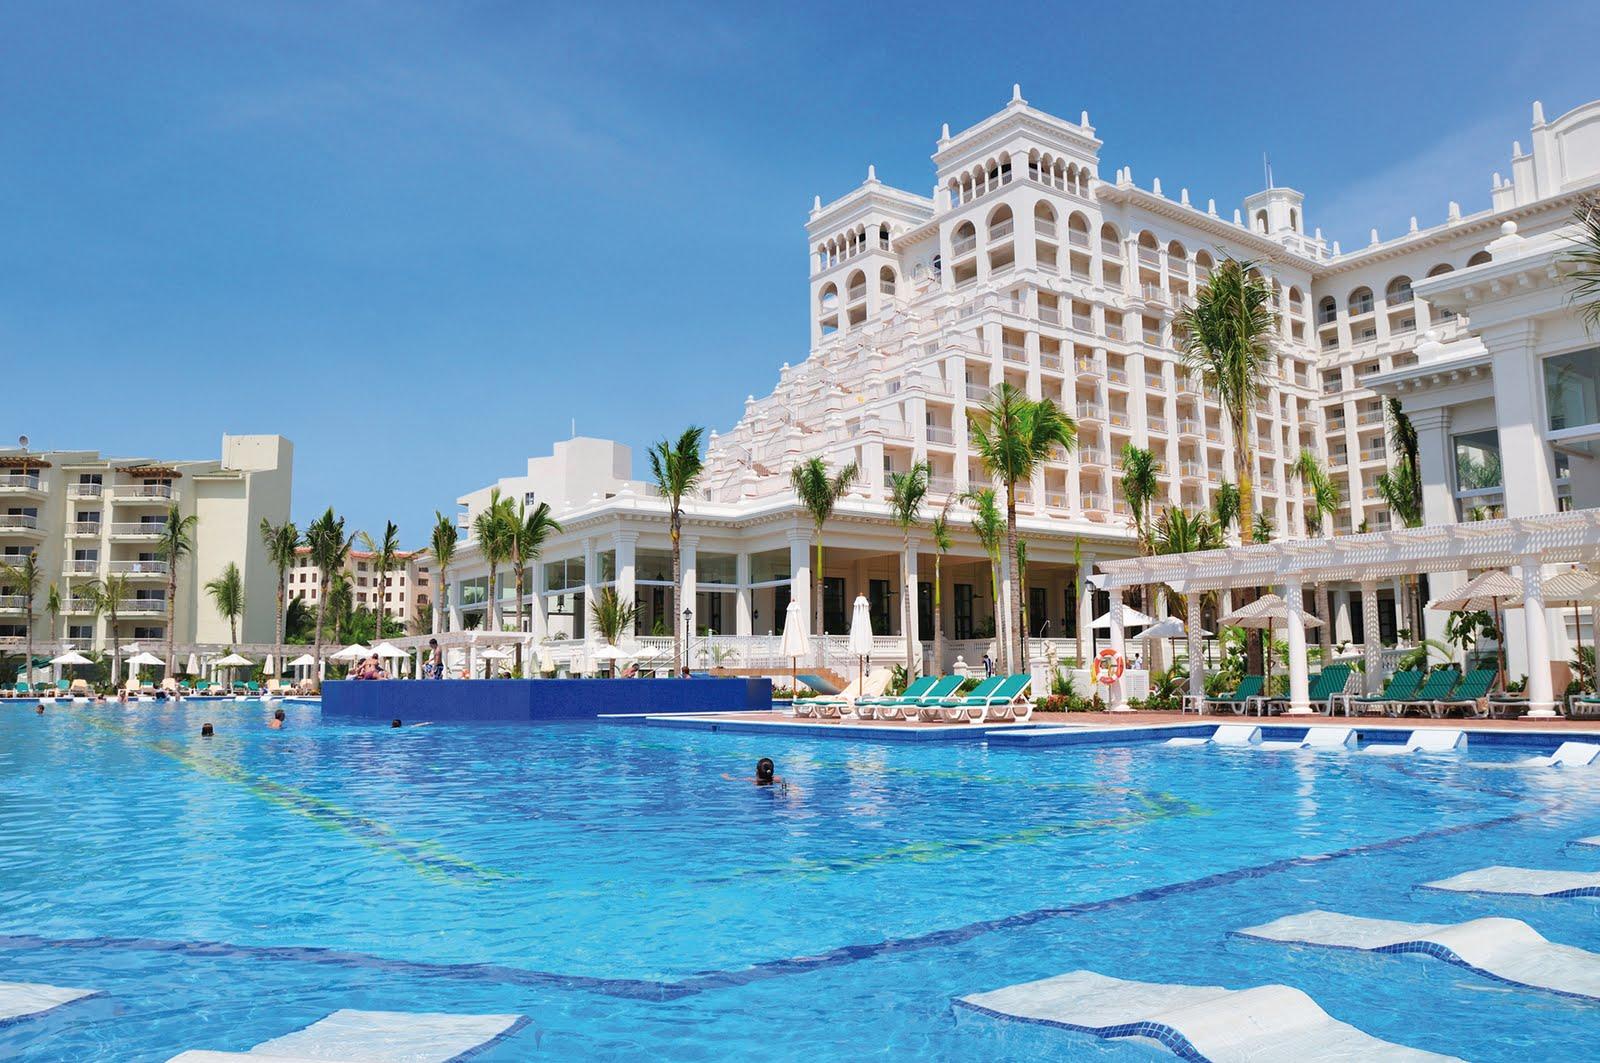 411 Travelbuys Blog 411travelbuys Ca Riu Palace Cabo San